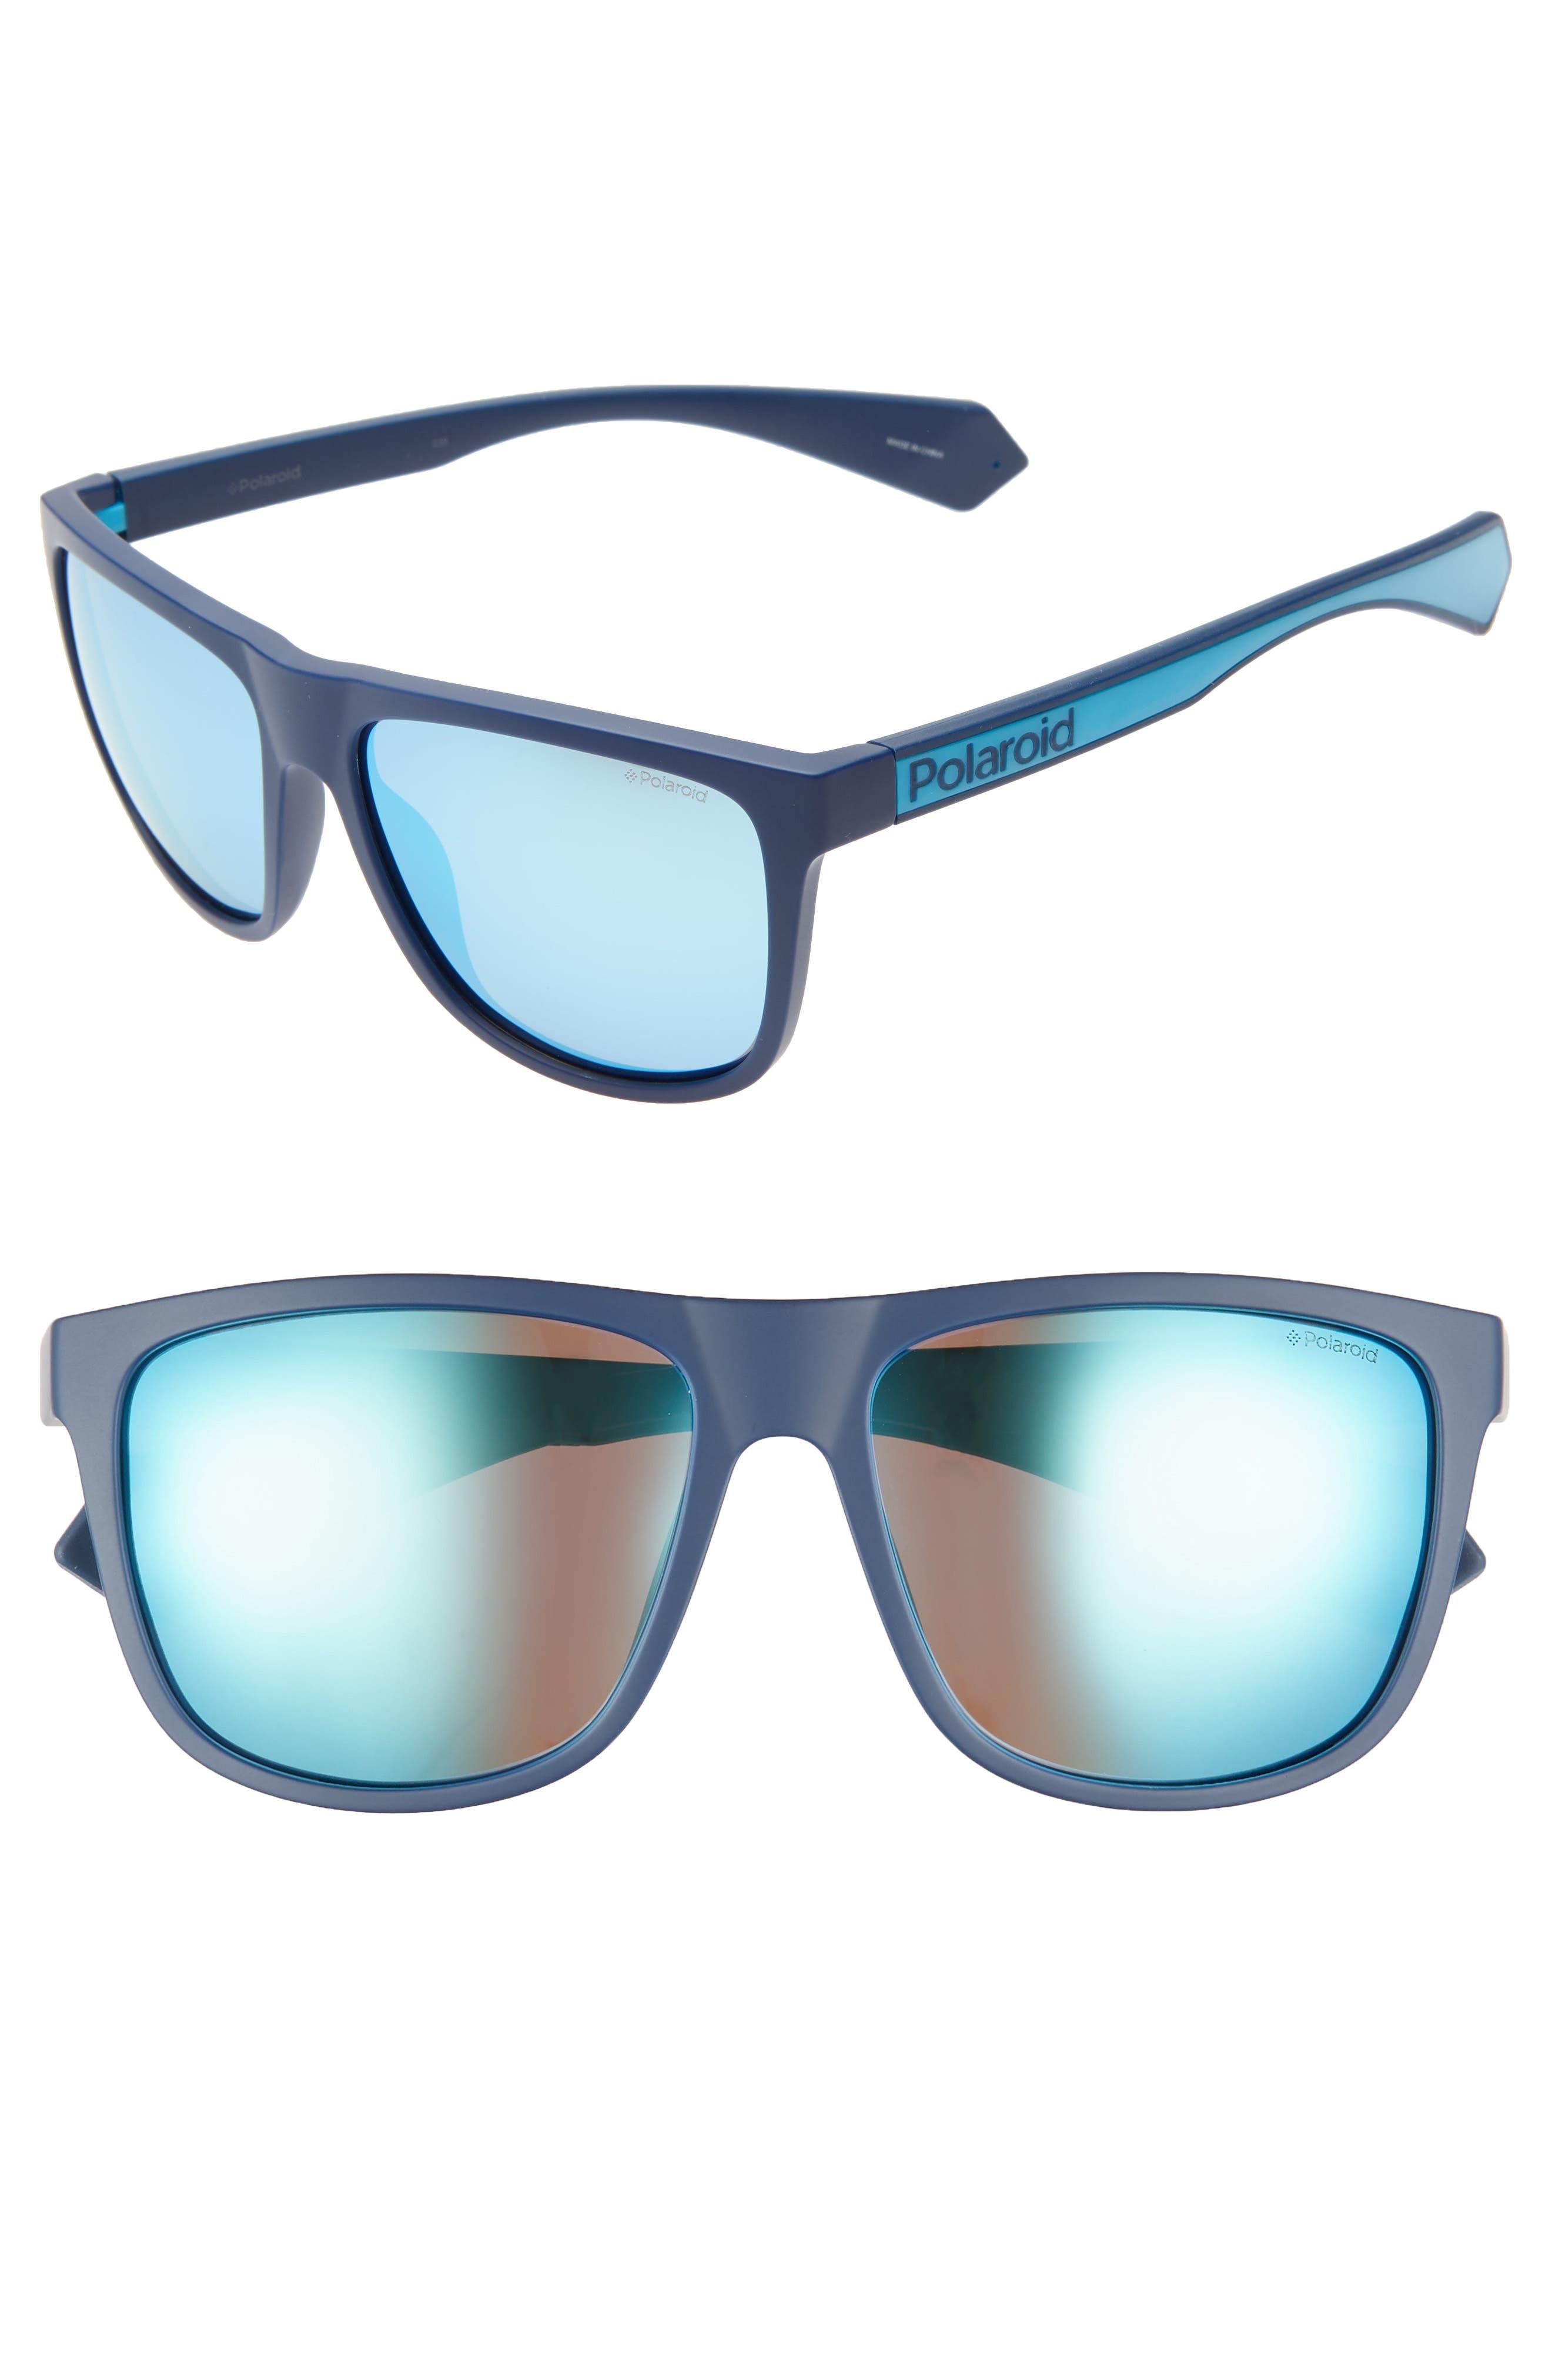 Plastic Core 57mm Polarized Sunglasses,                             Main thumbnail 1, color,                             BLUE